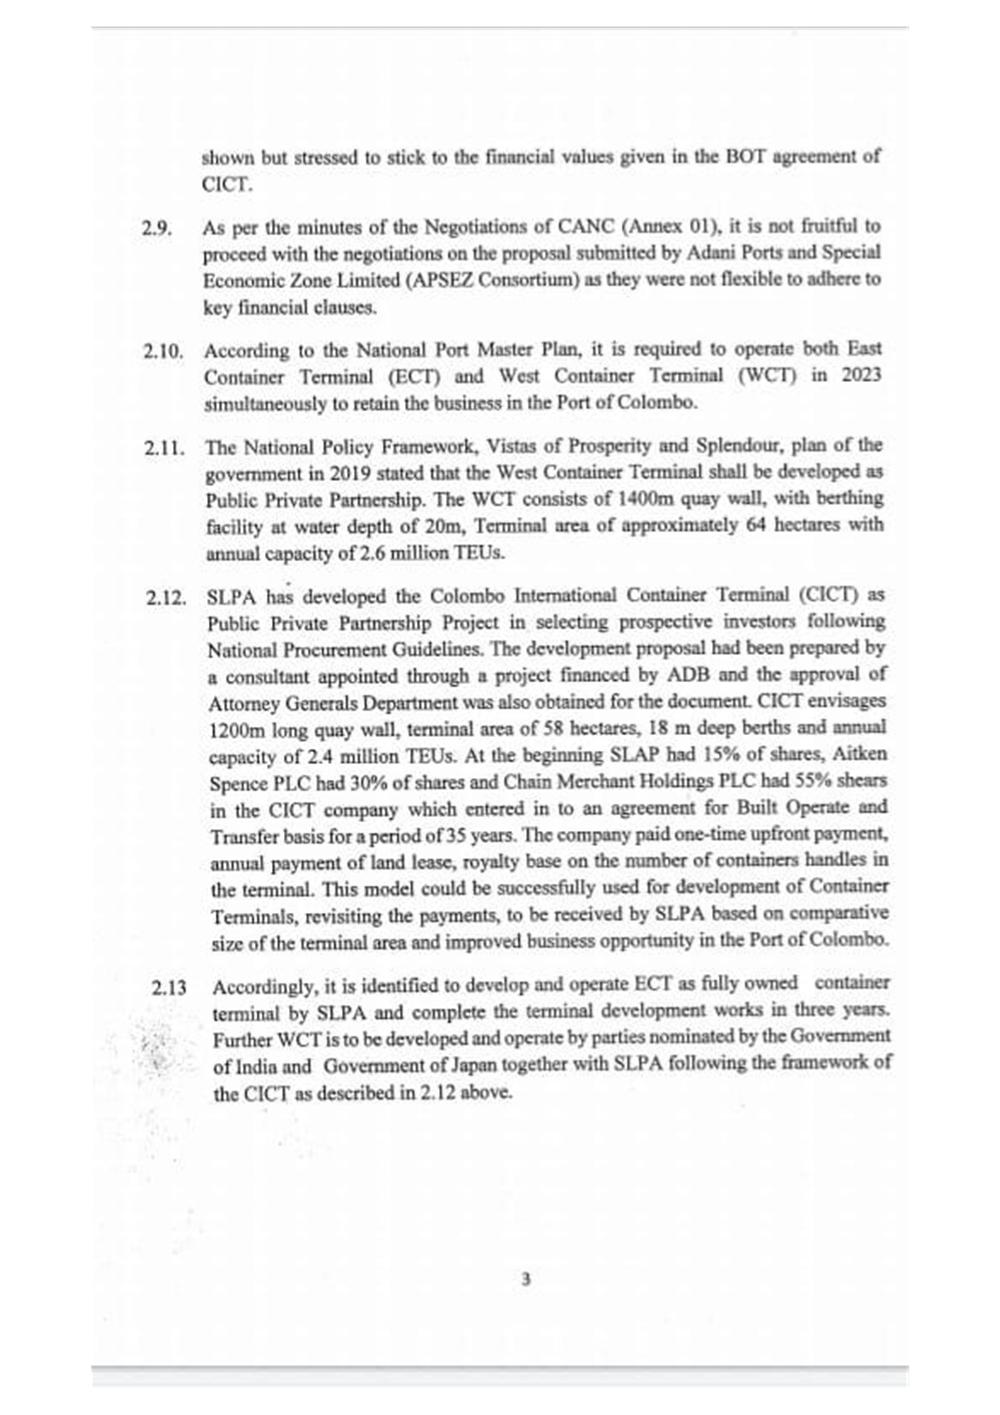 Sri Lankan Government Cabinet Memorandum 31 January 2021, p.3